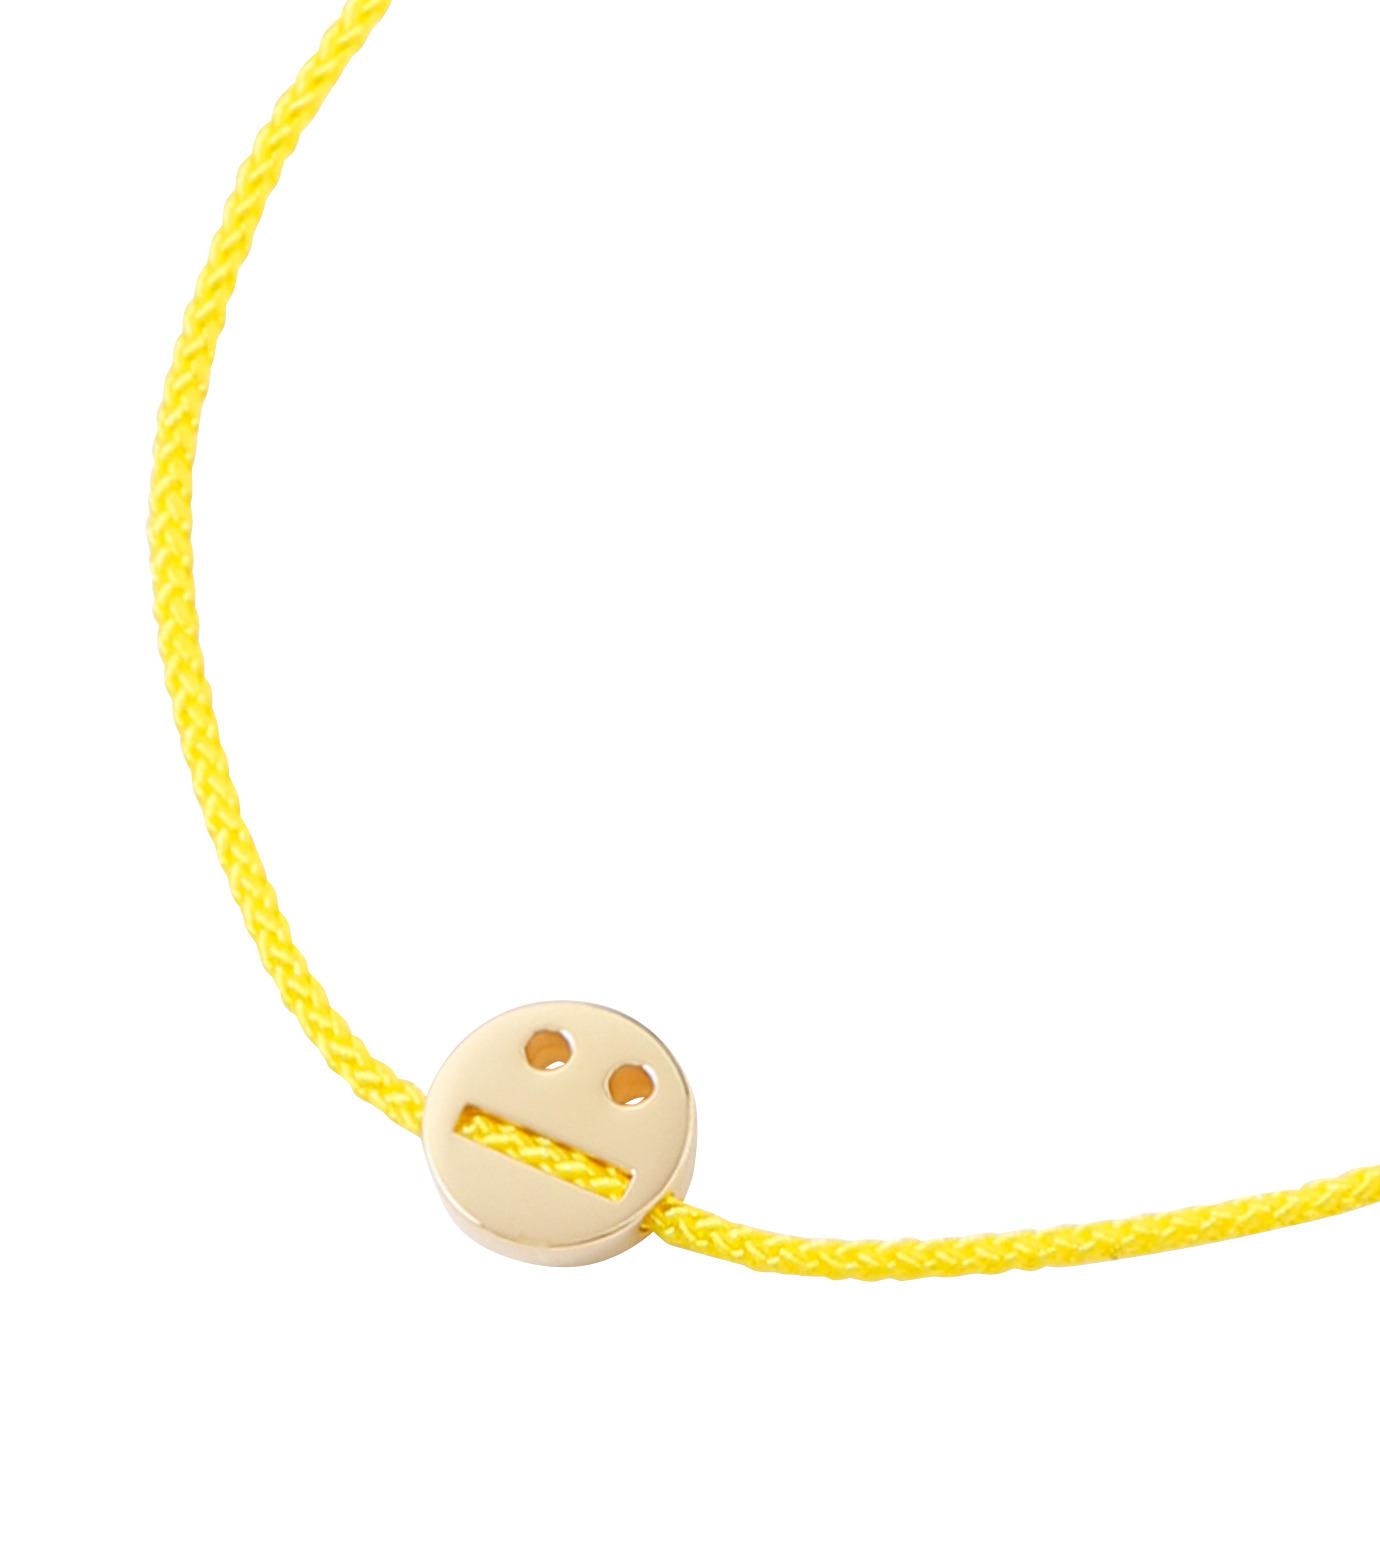 RUIFIER(ルイフフェラ)のFriends Bracelet Gold-YELLOW(ブレスレット/bracelet)-BVE56VB0L-32 拡大詳細画像2